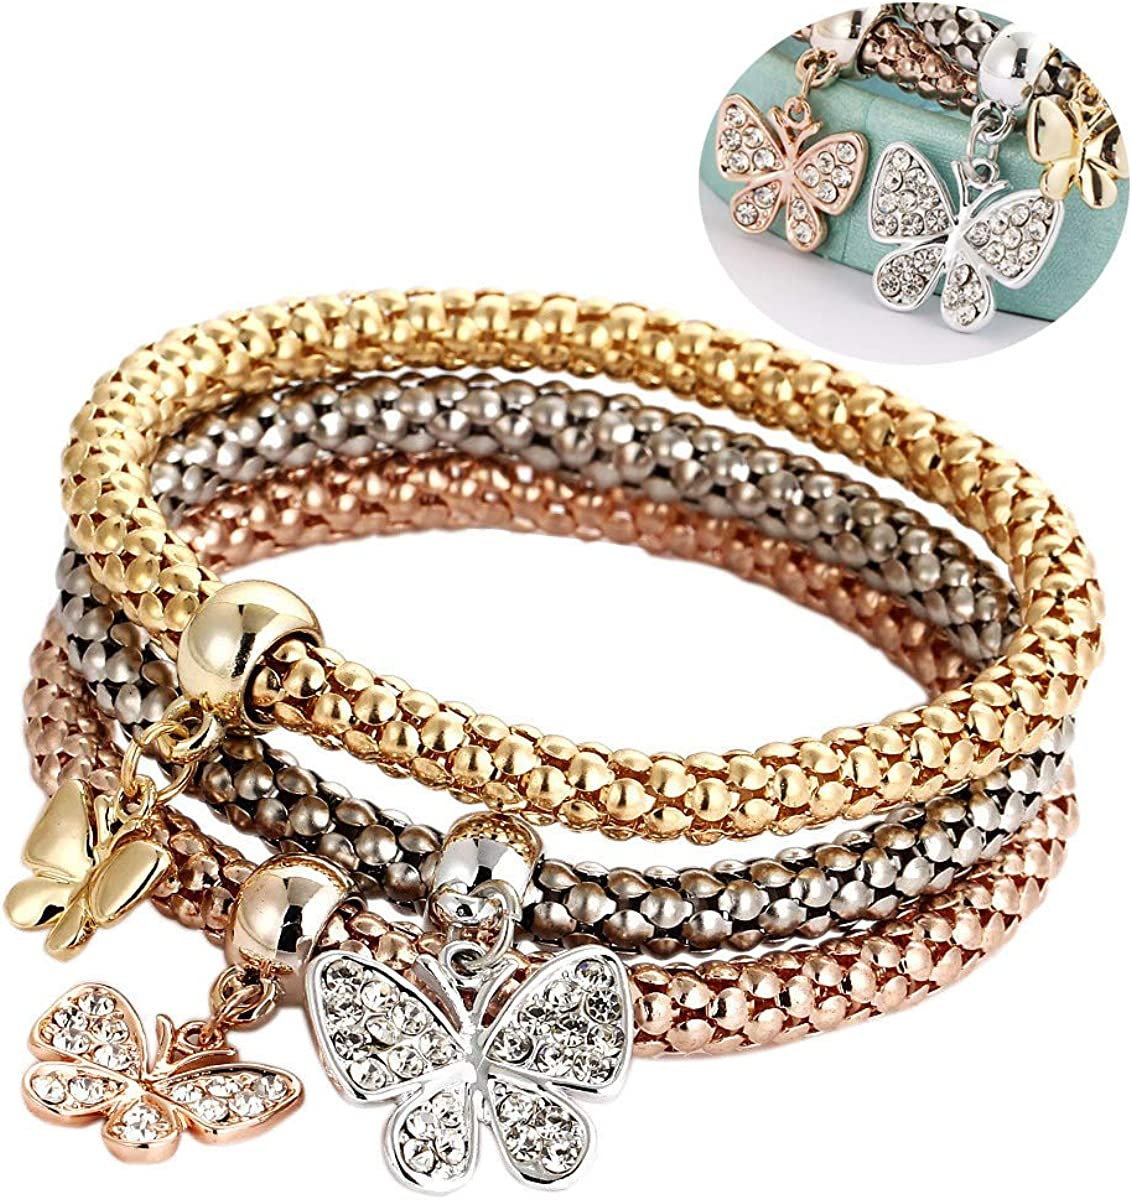 Amazon.com: Koolee Women's Bracelet, 3 Pcs Fashion Rhinestone Bangle Gold  Silver Rose Gold Charm Butterfly Bracelets Bangles Jewelry for Women Girl:  Jewelry